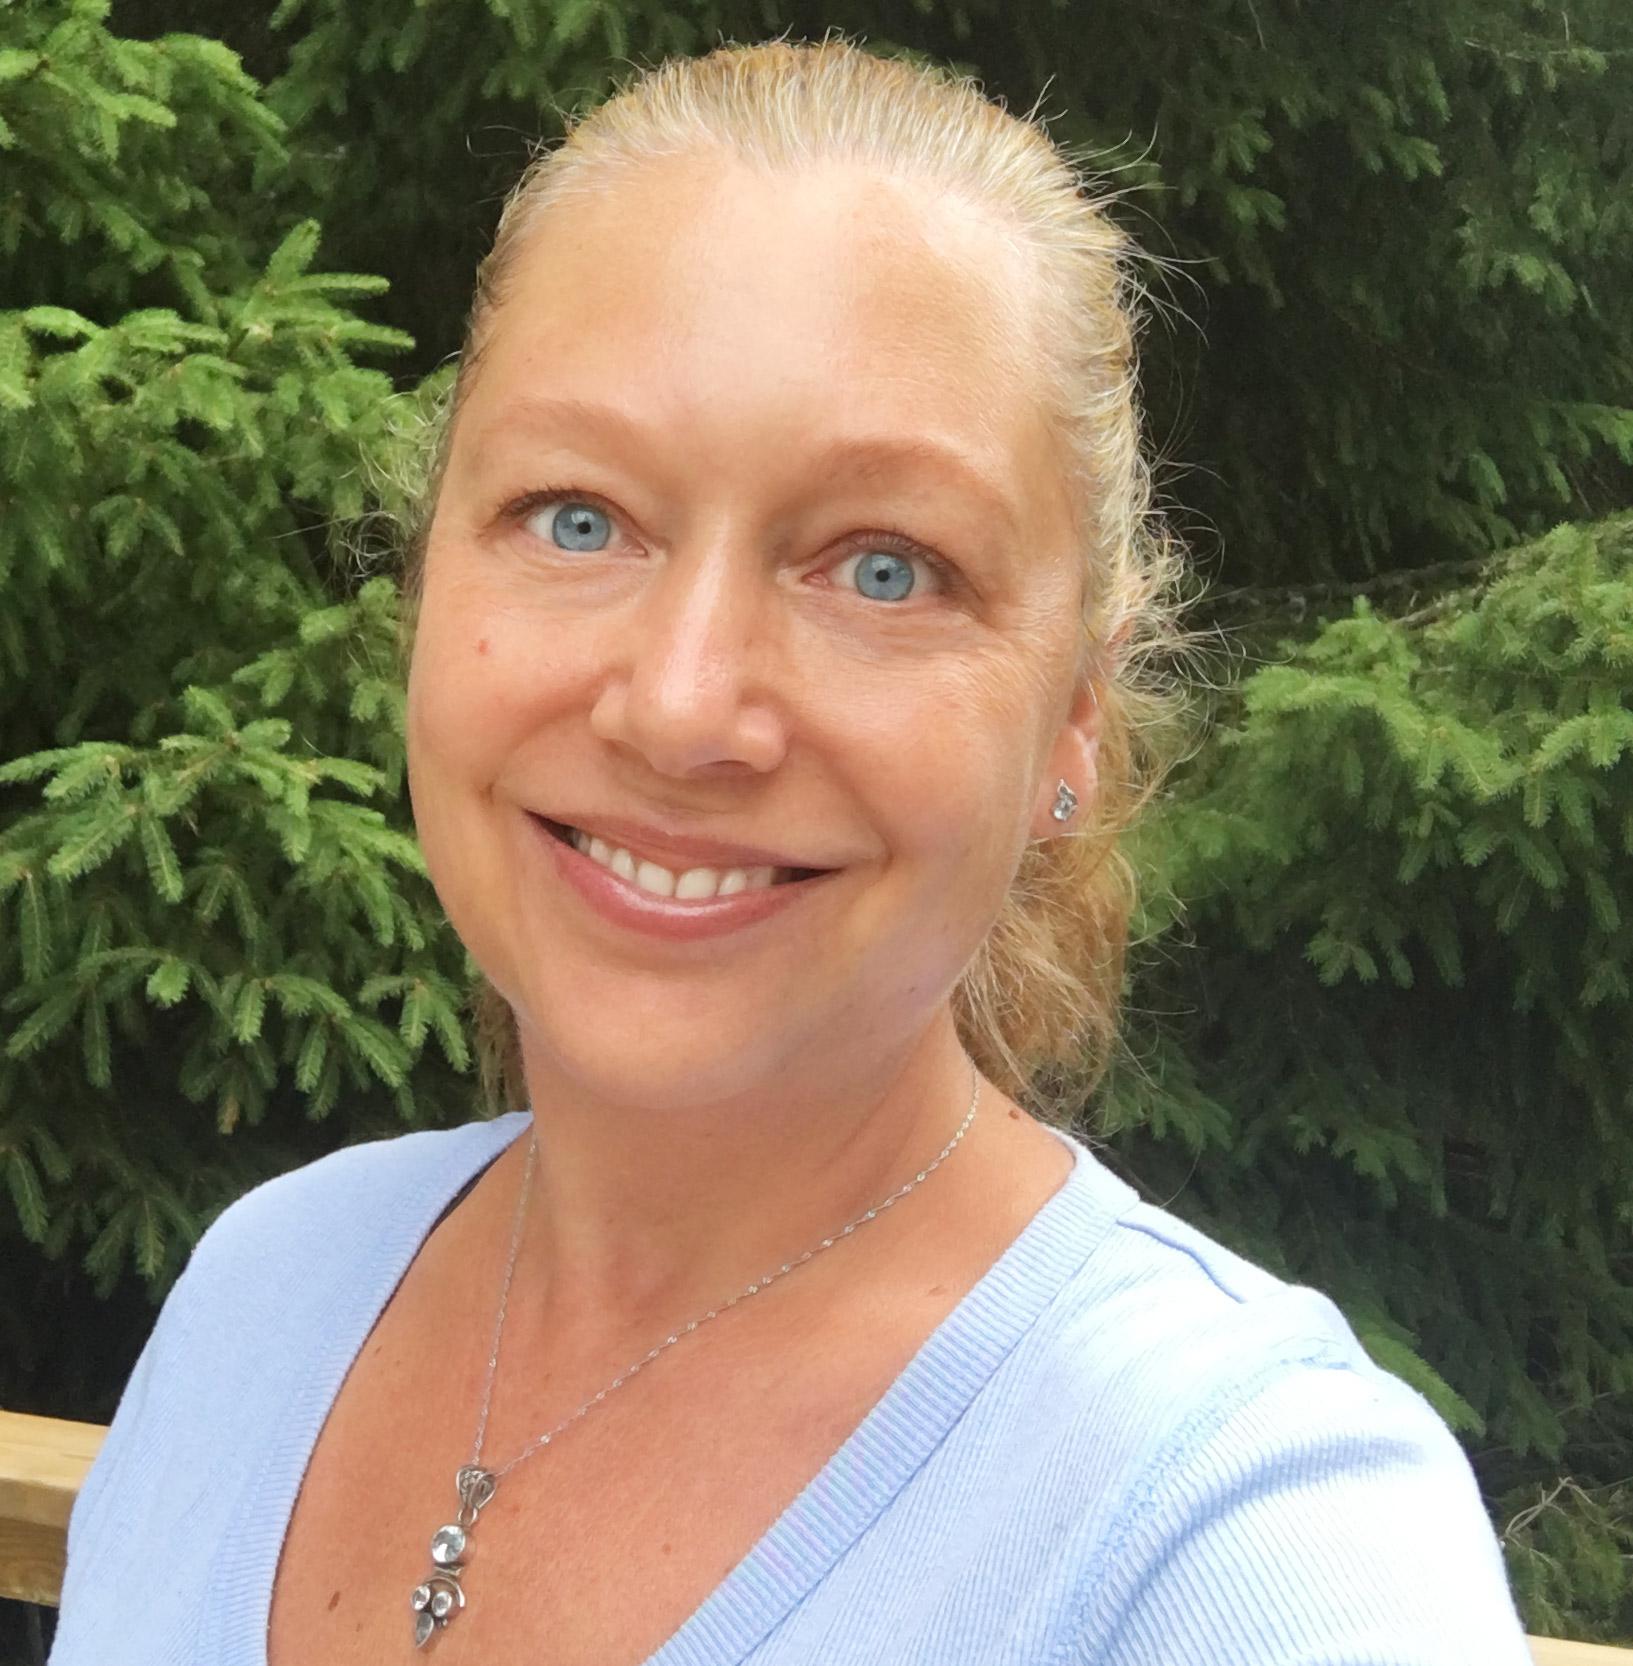 Camilla Thornander